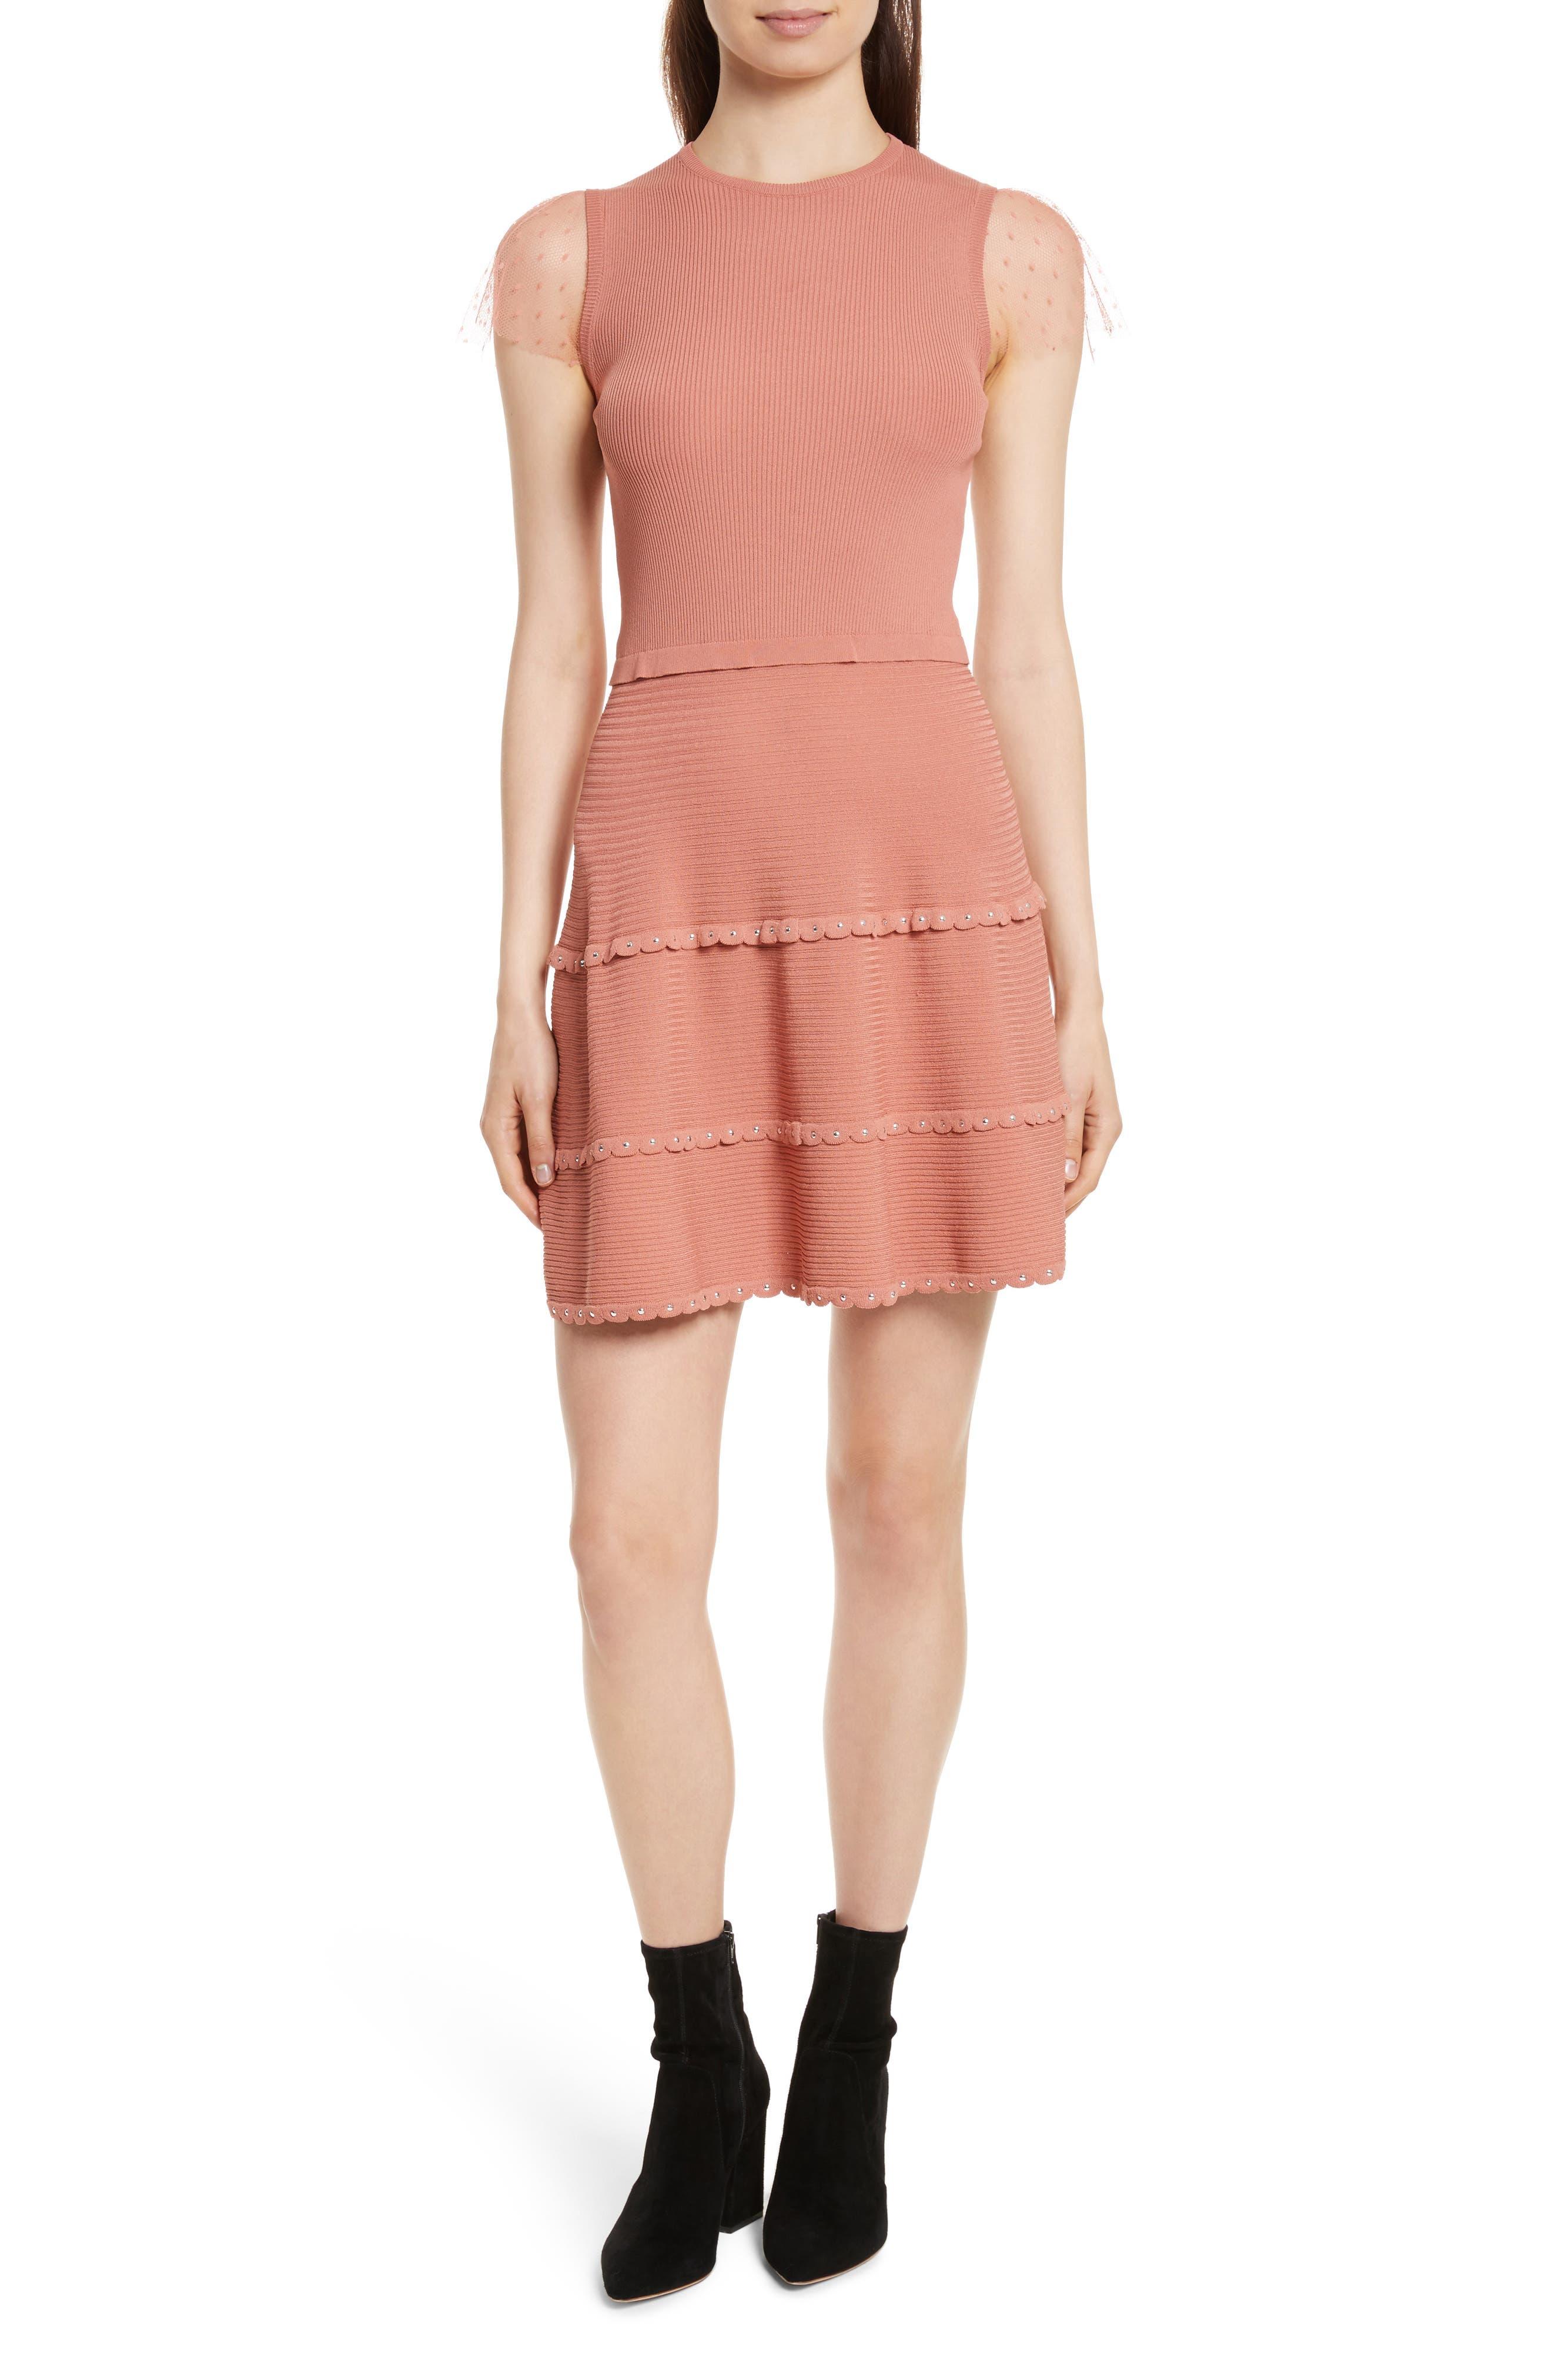 RED Valentino Scallop Stretch Knit Dress